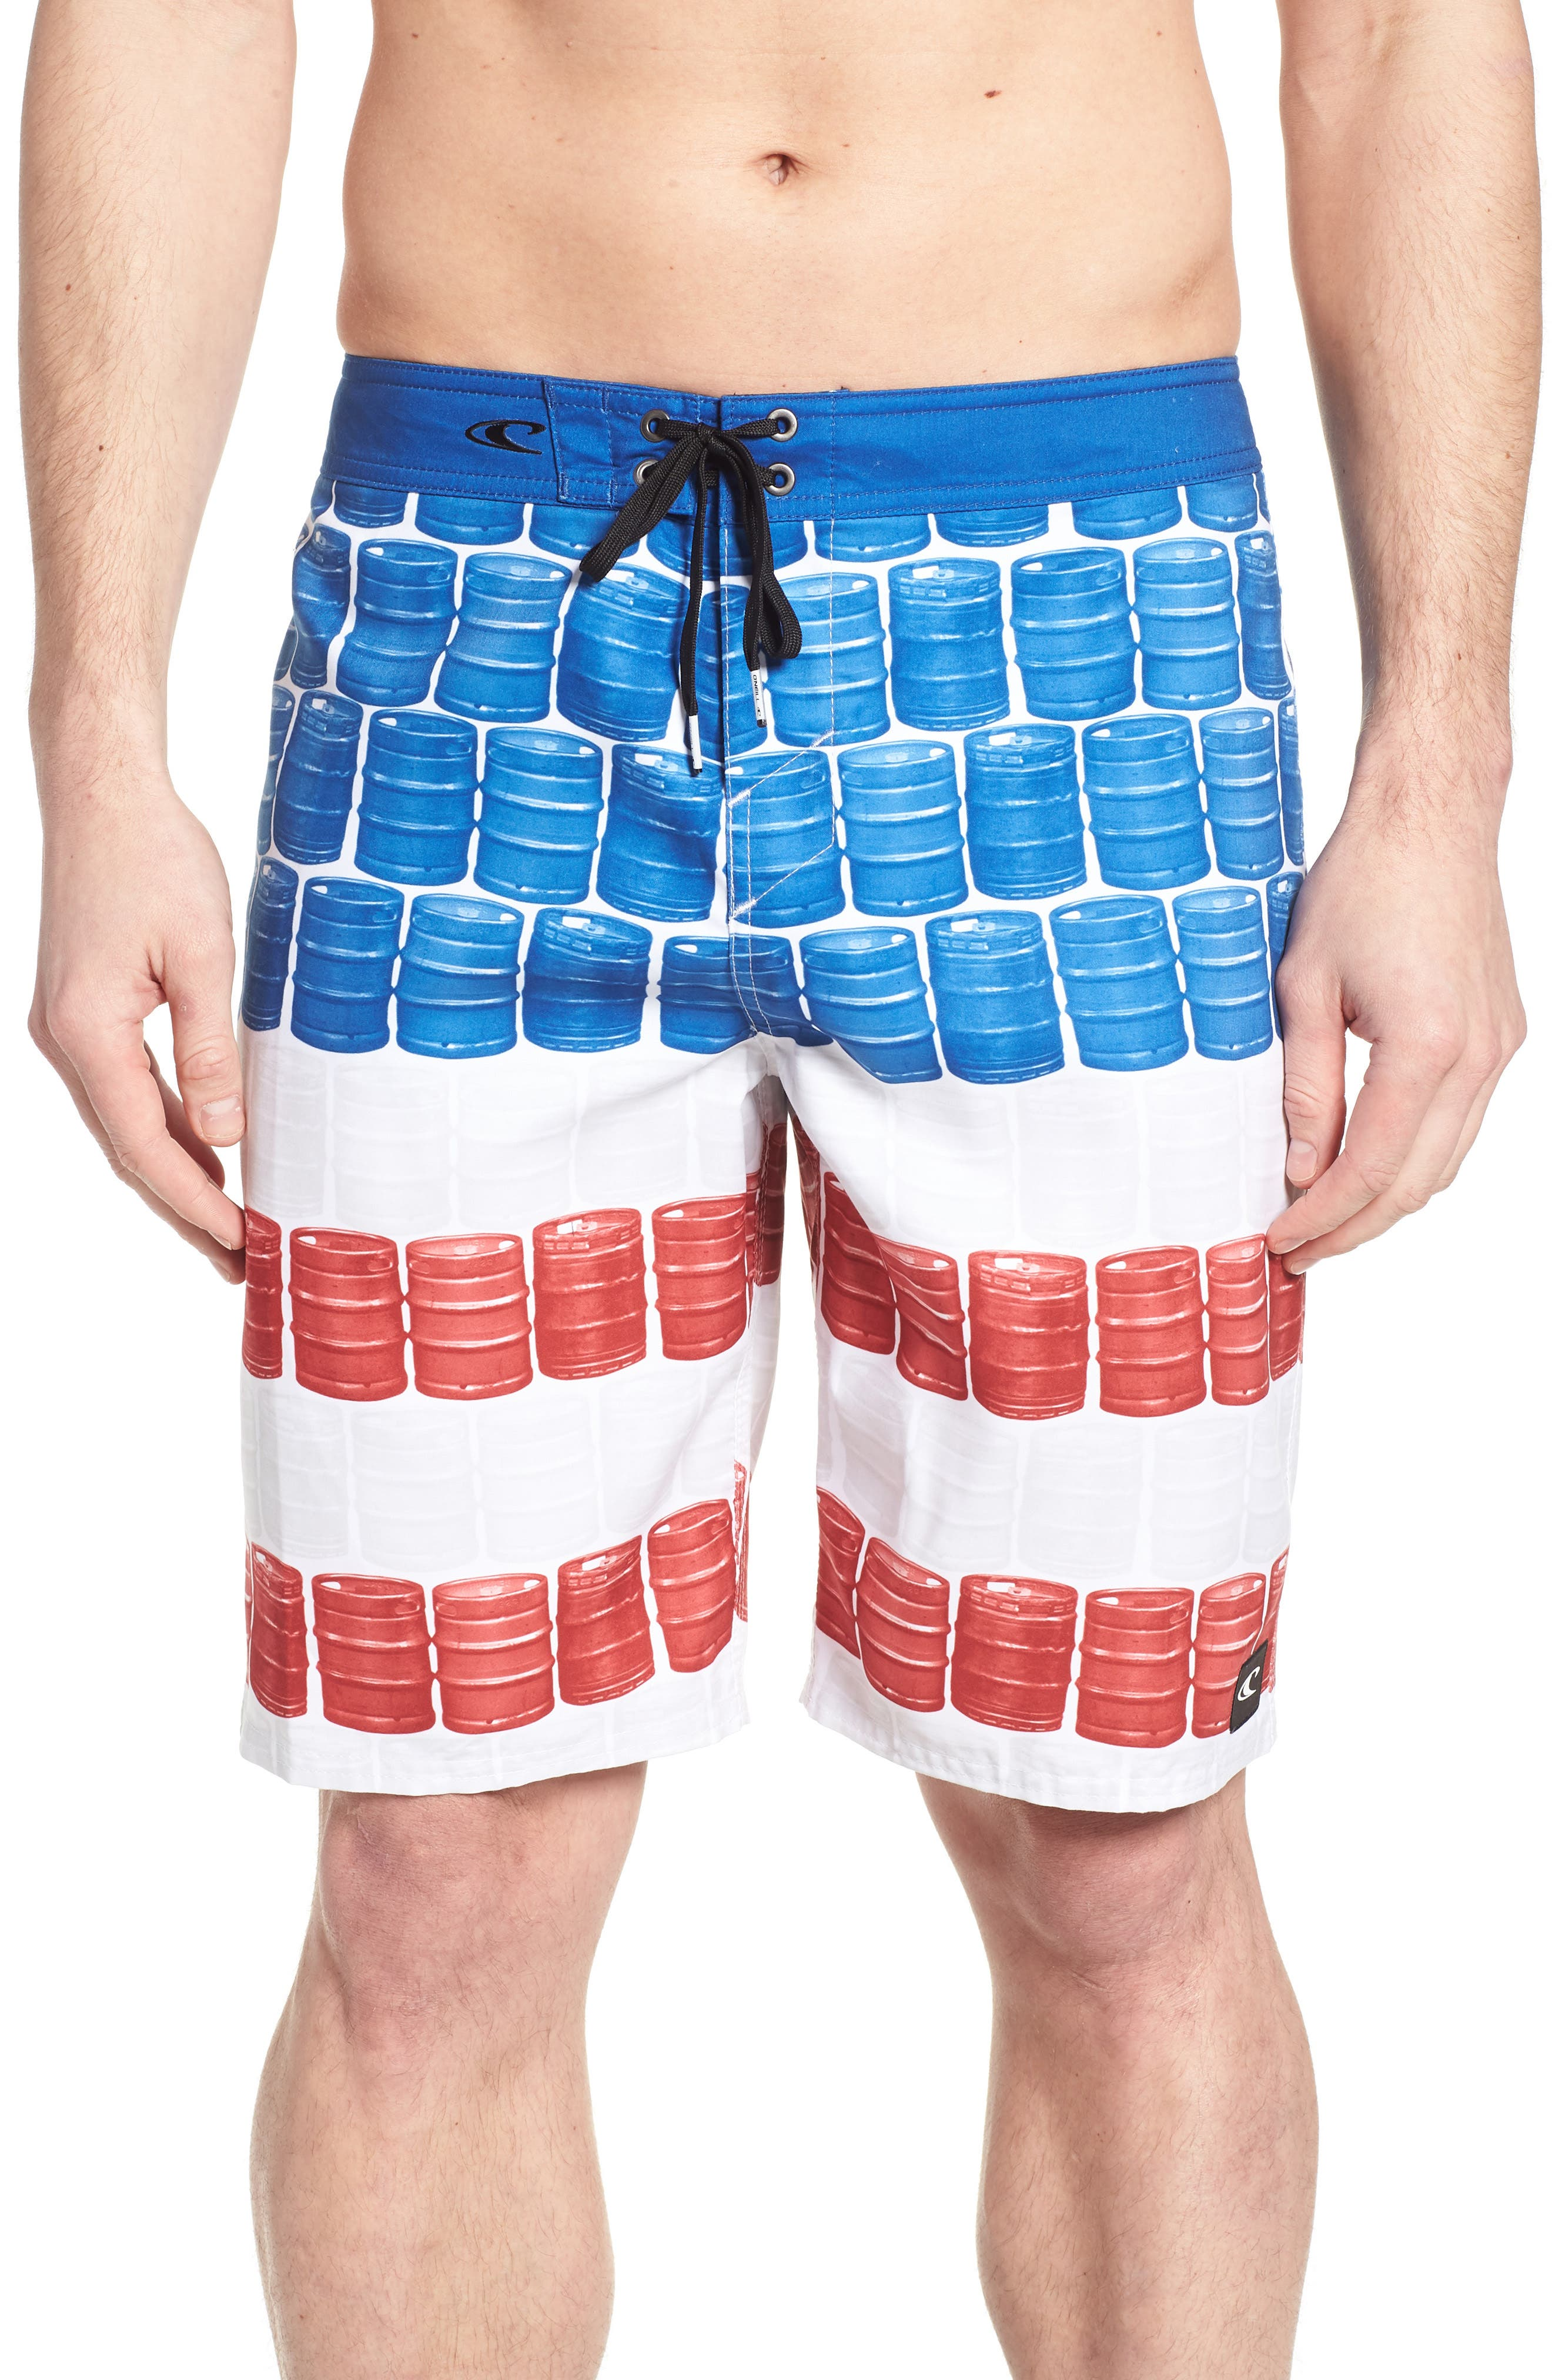 Kegleg Board Shorts,                             Main thumbnail 1, color,                             840